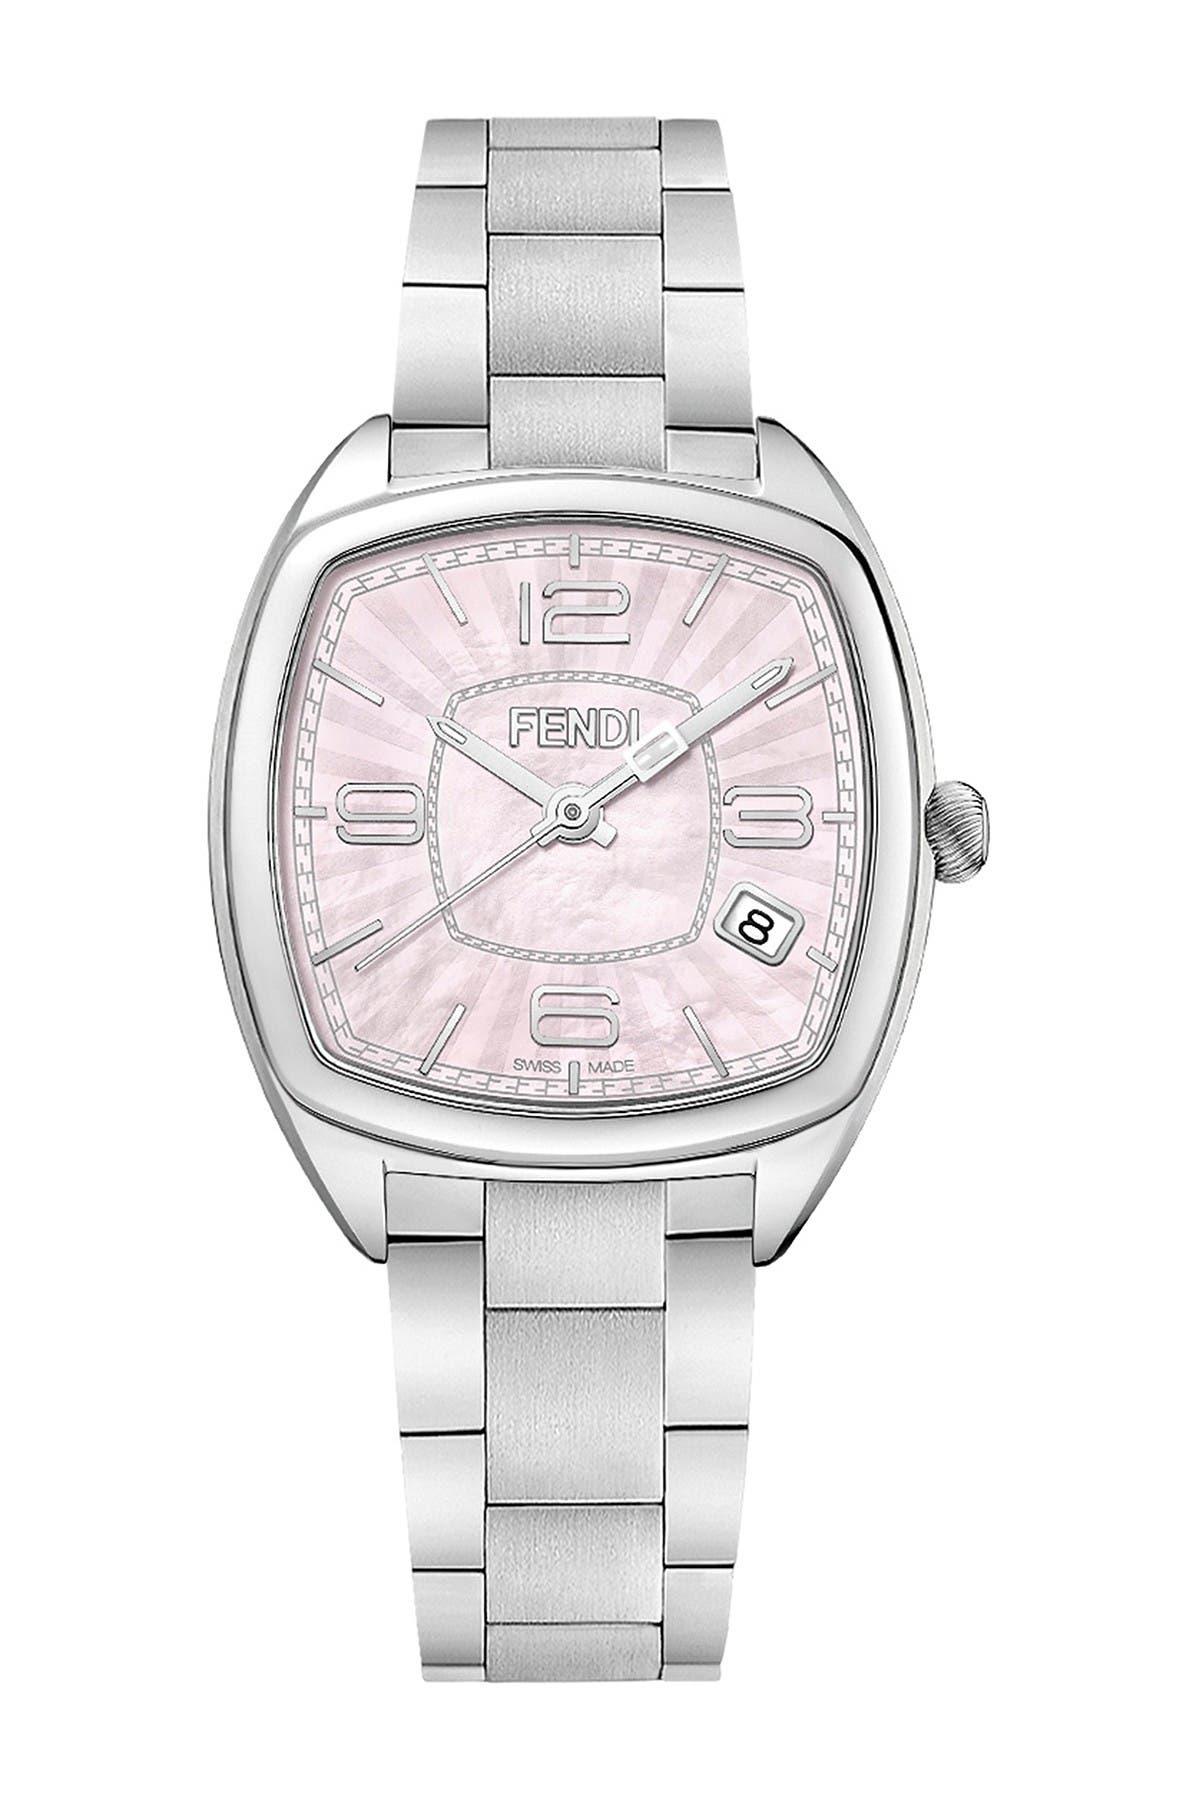 Image of FENDI Women's Momento Rectangular Pink Dial Watch, 32mm